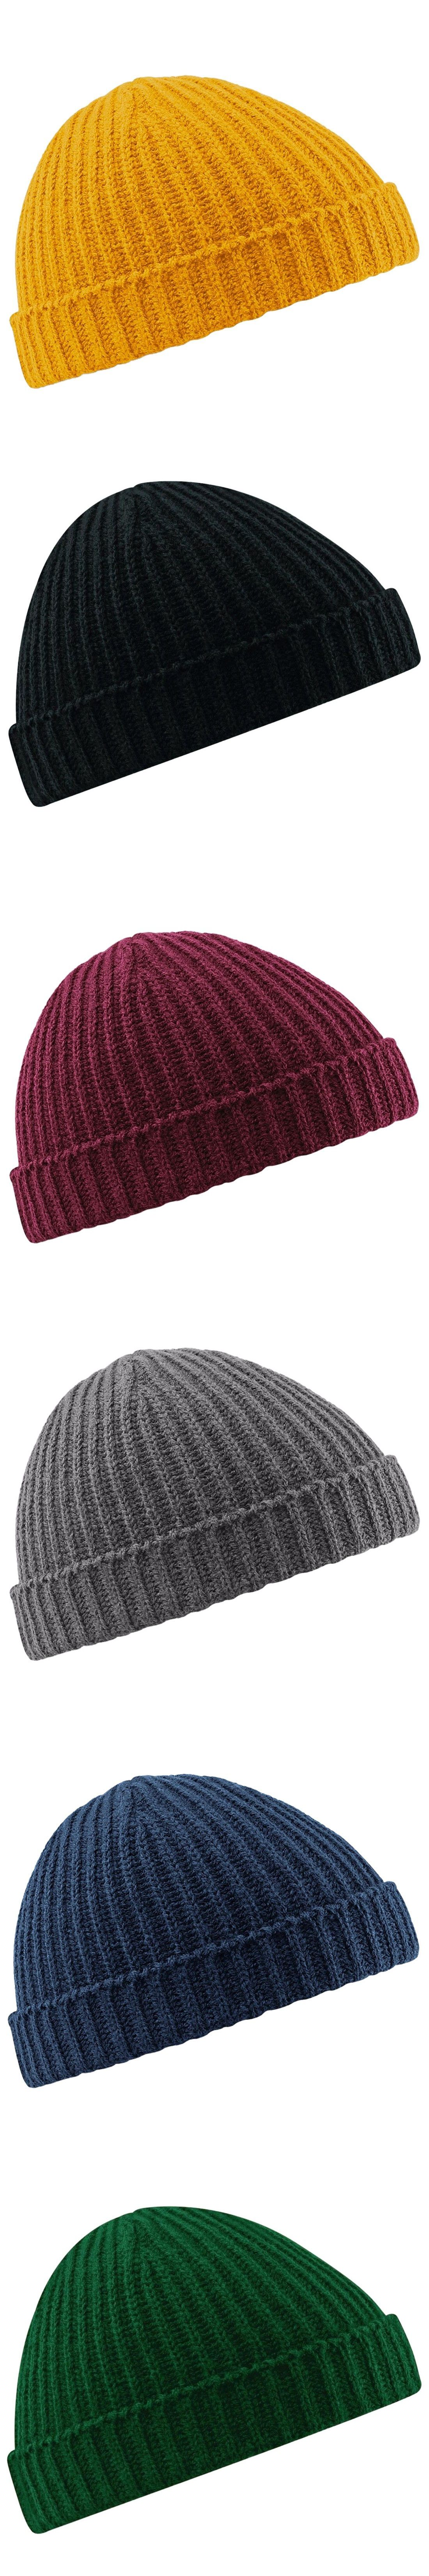 0d377a3850e Fisherman Beanie Ribbed Hat Winter Warm Turn Up Retro Mens Womens Ladies